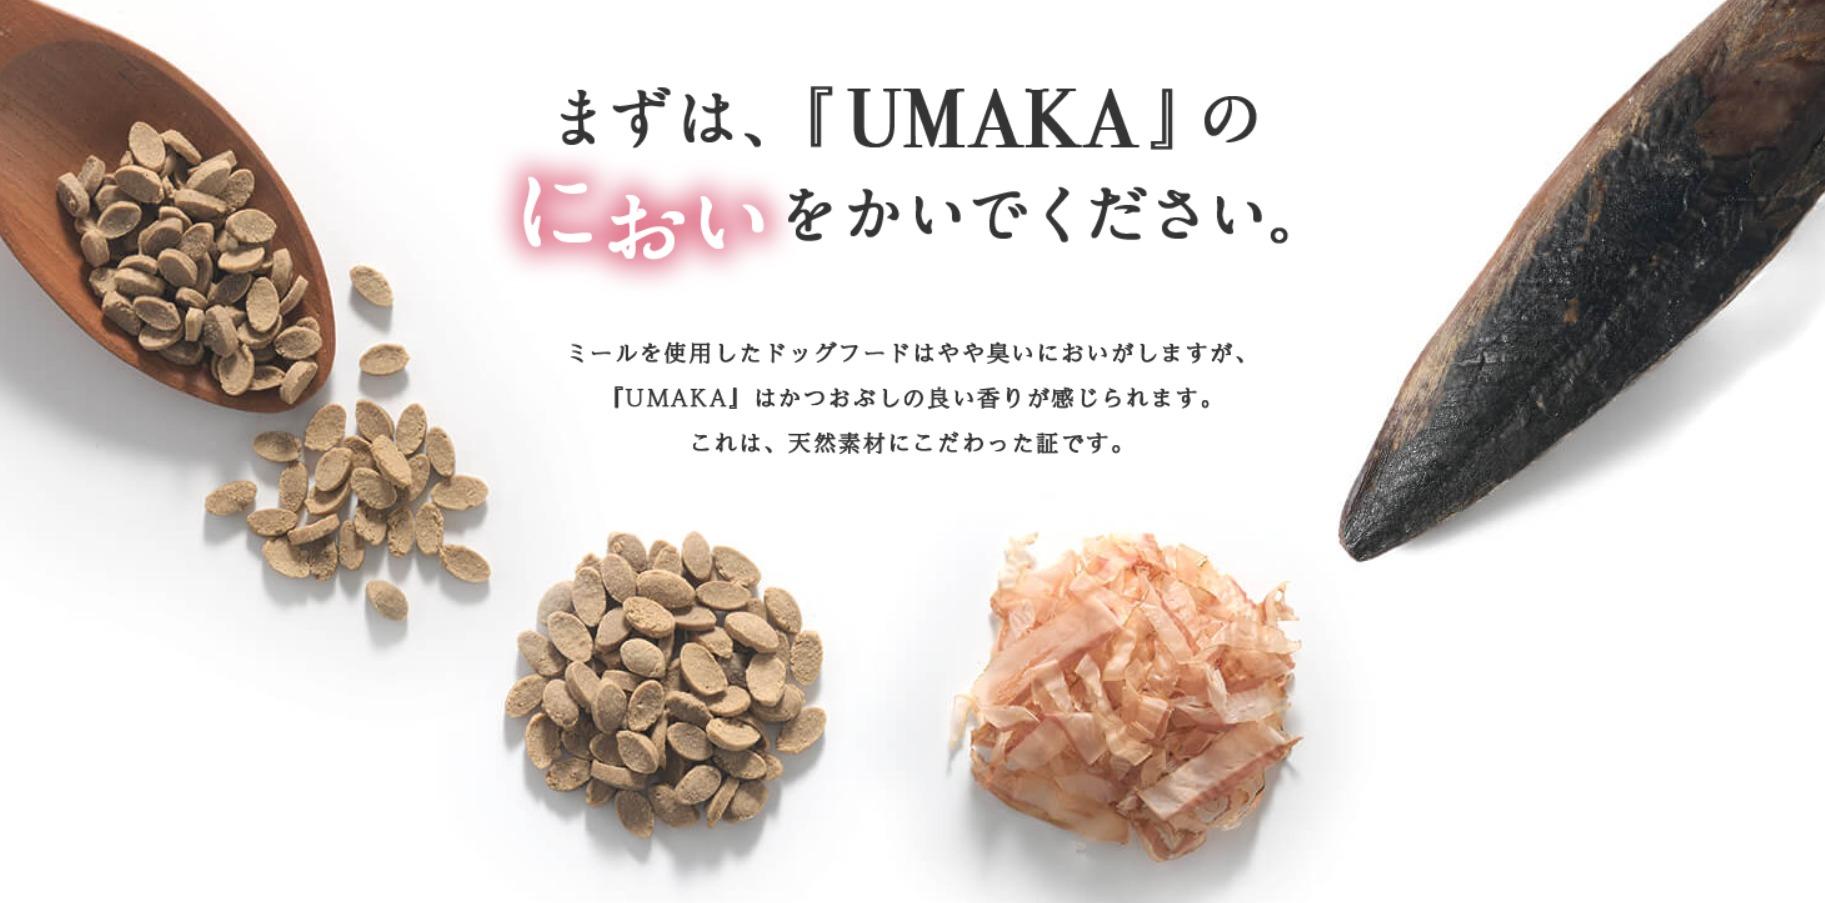 UMAKA(美味華)ドッグフードの効果・効能